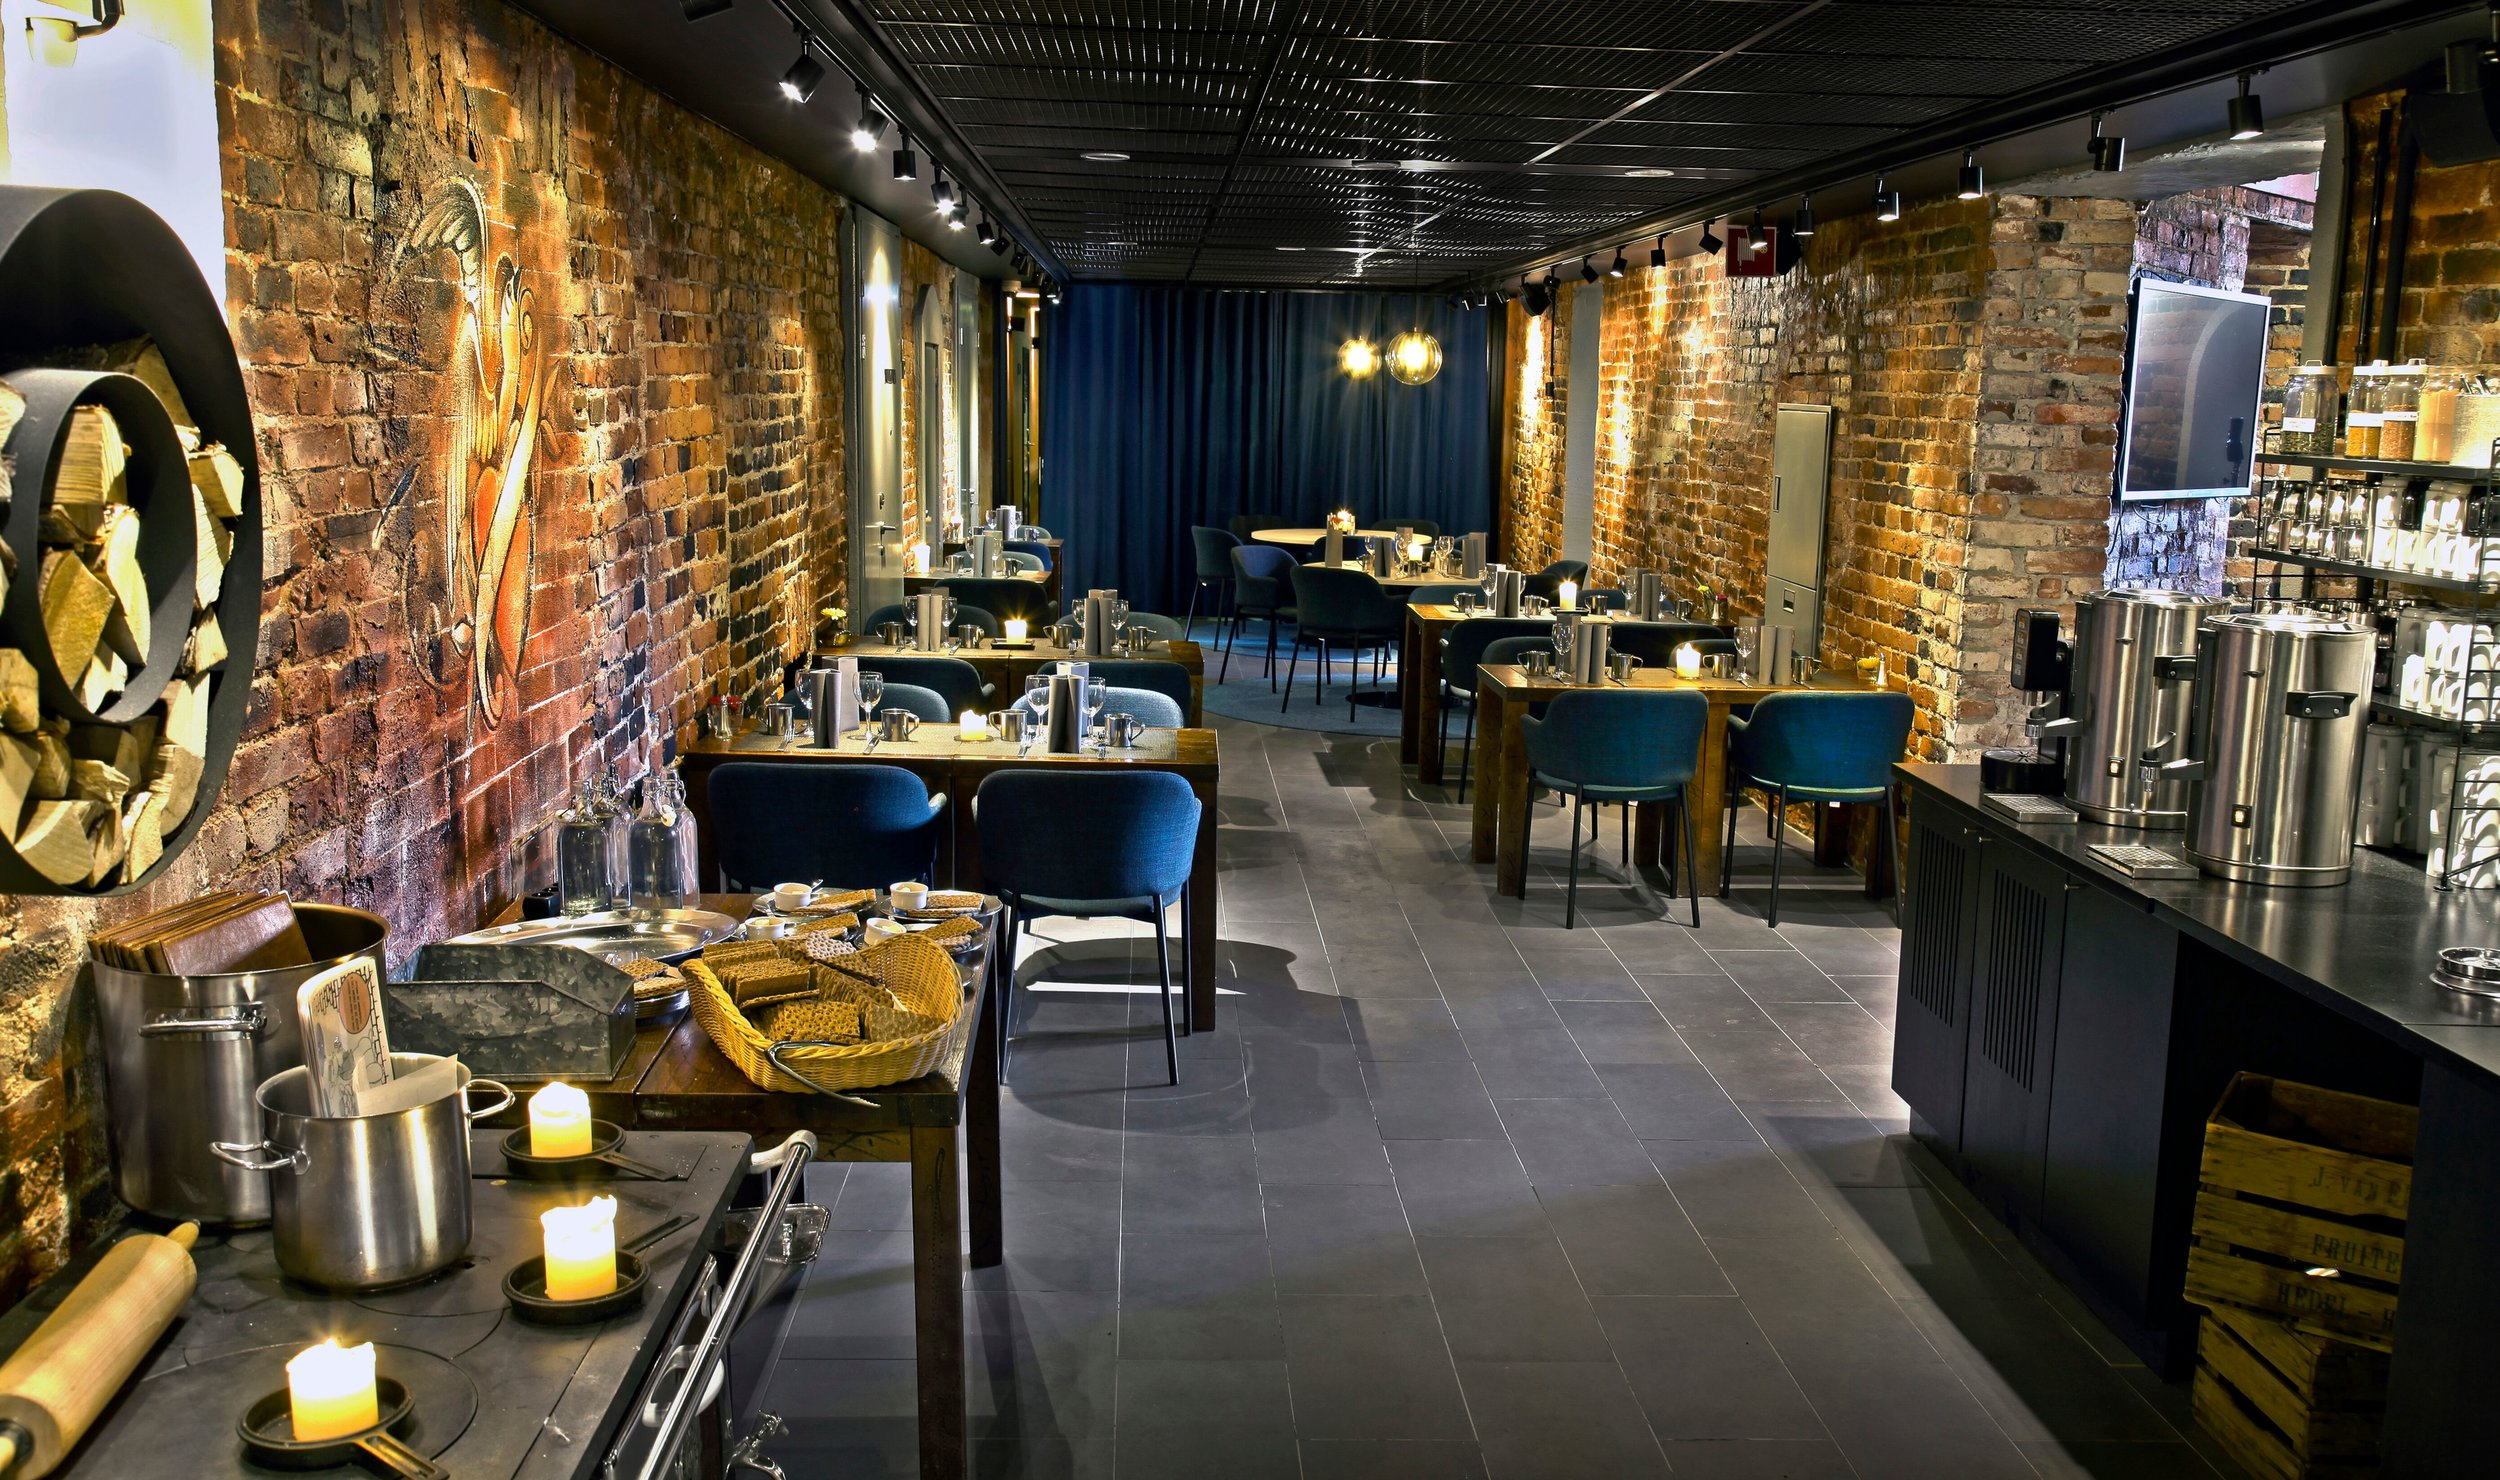 Restaurant_Linnankellari_2_copyright_Nina_Pauloff.jpg